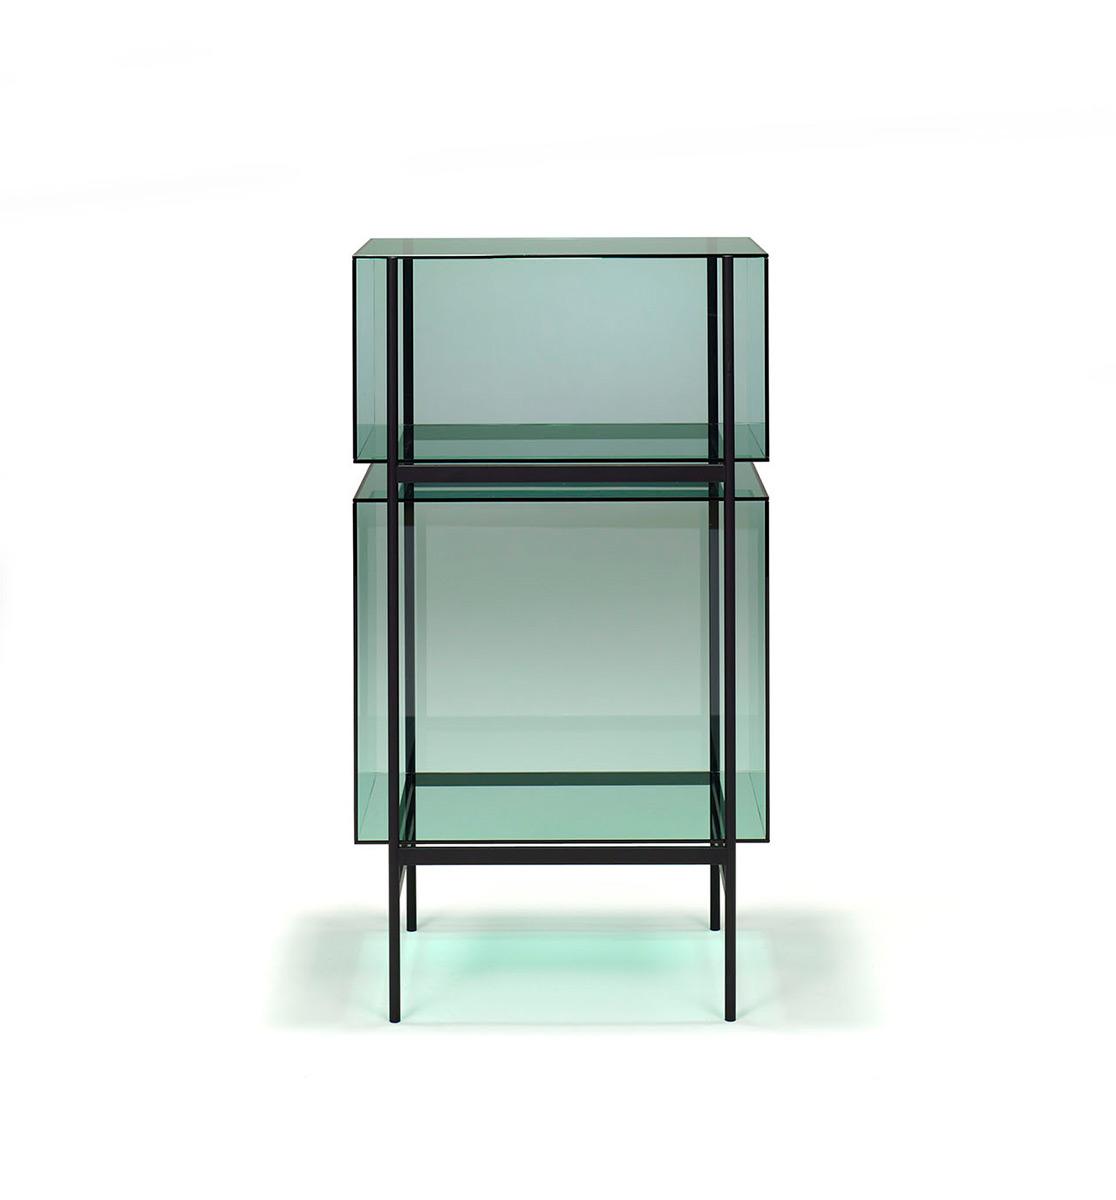 Lyn-collection-Visser-Meijwaard-Pulpo-05